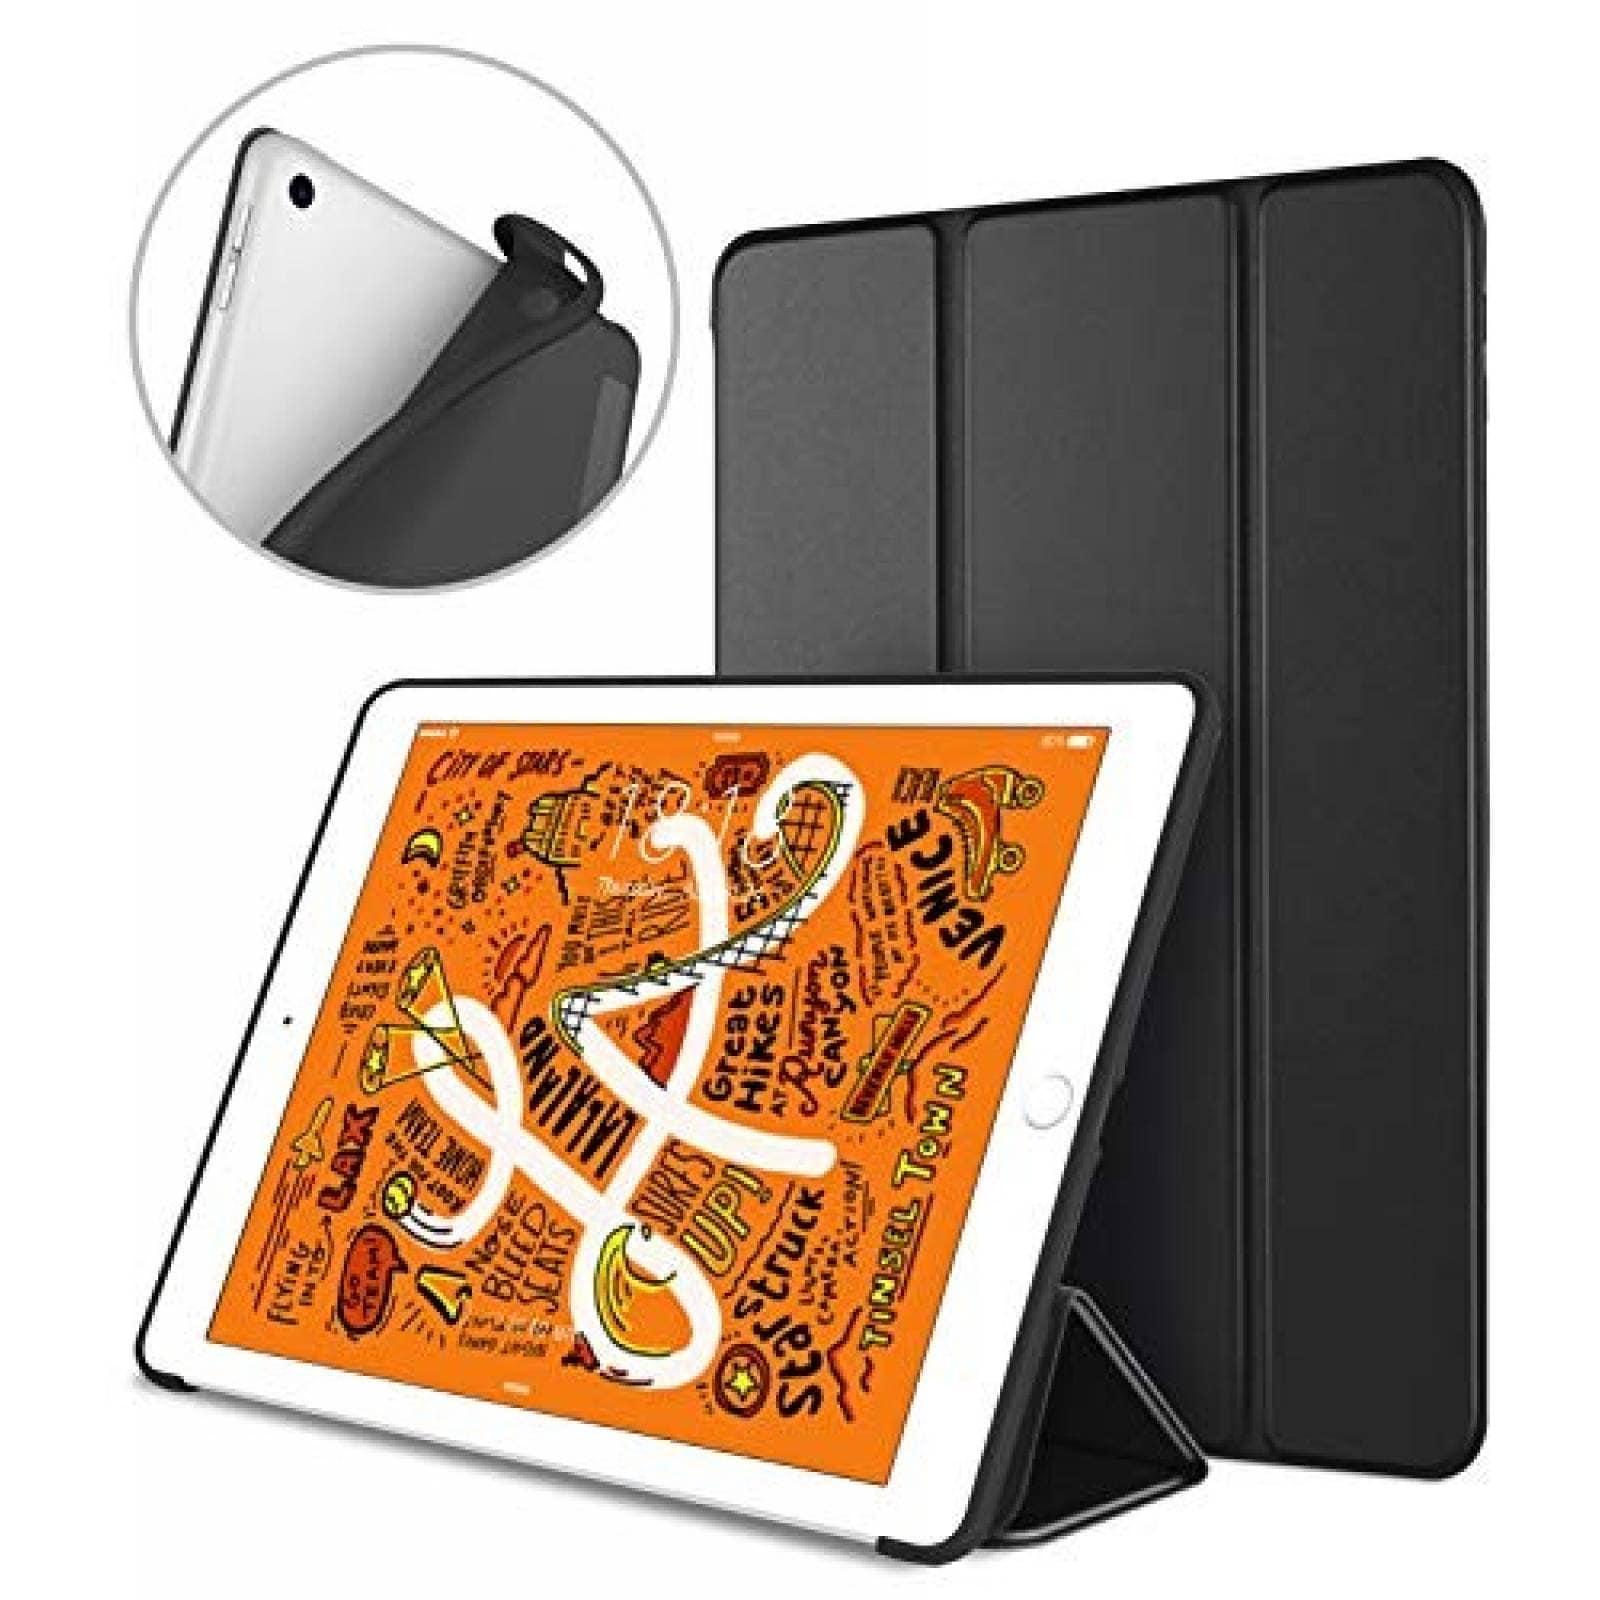 Funda DTTO para iPad Mini 5th Gen con Autobloqueo -Negro